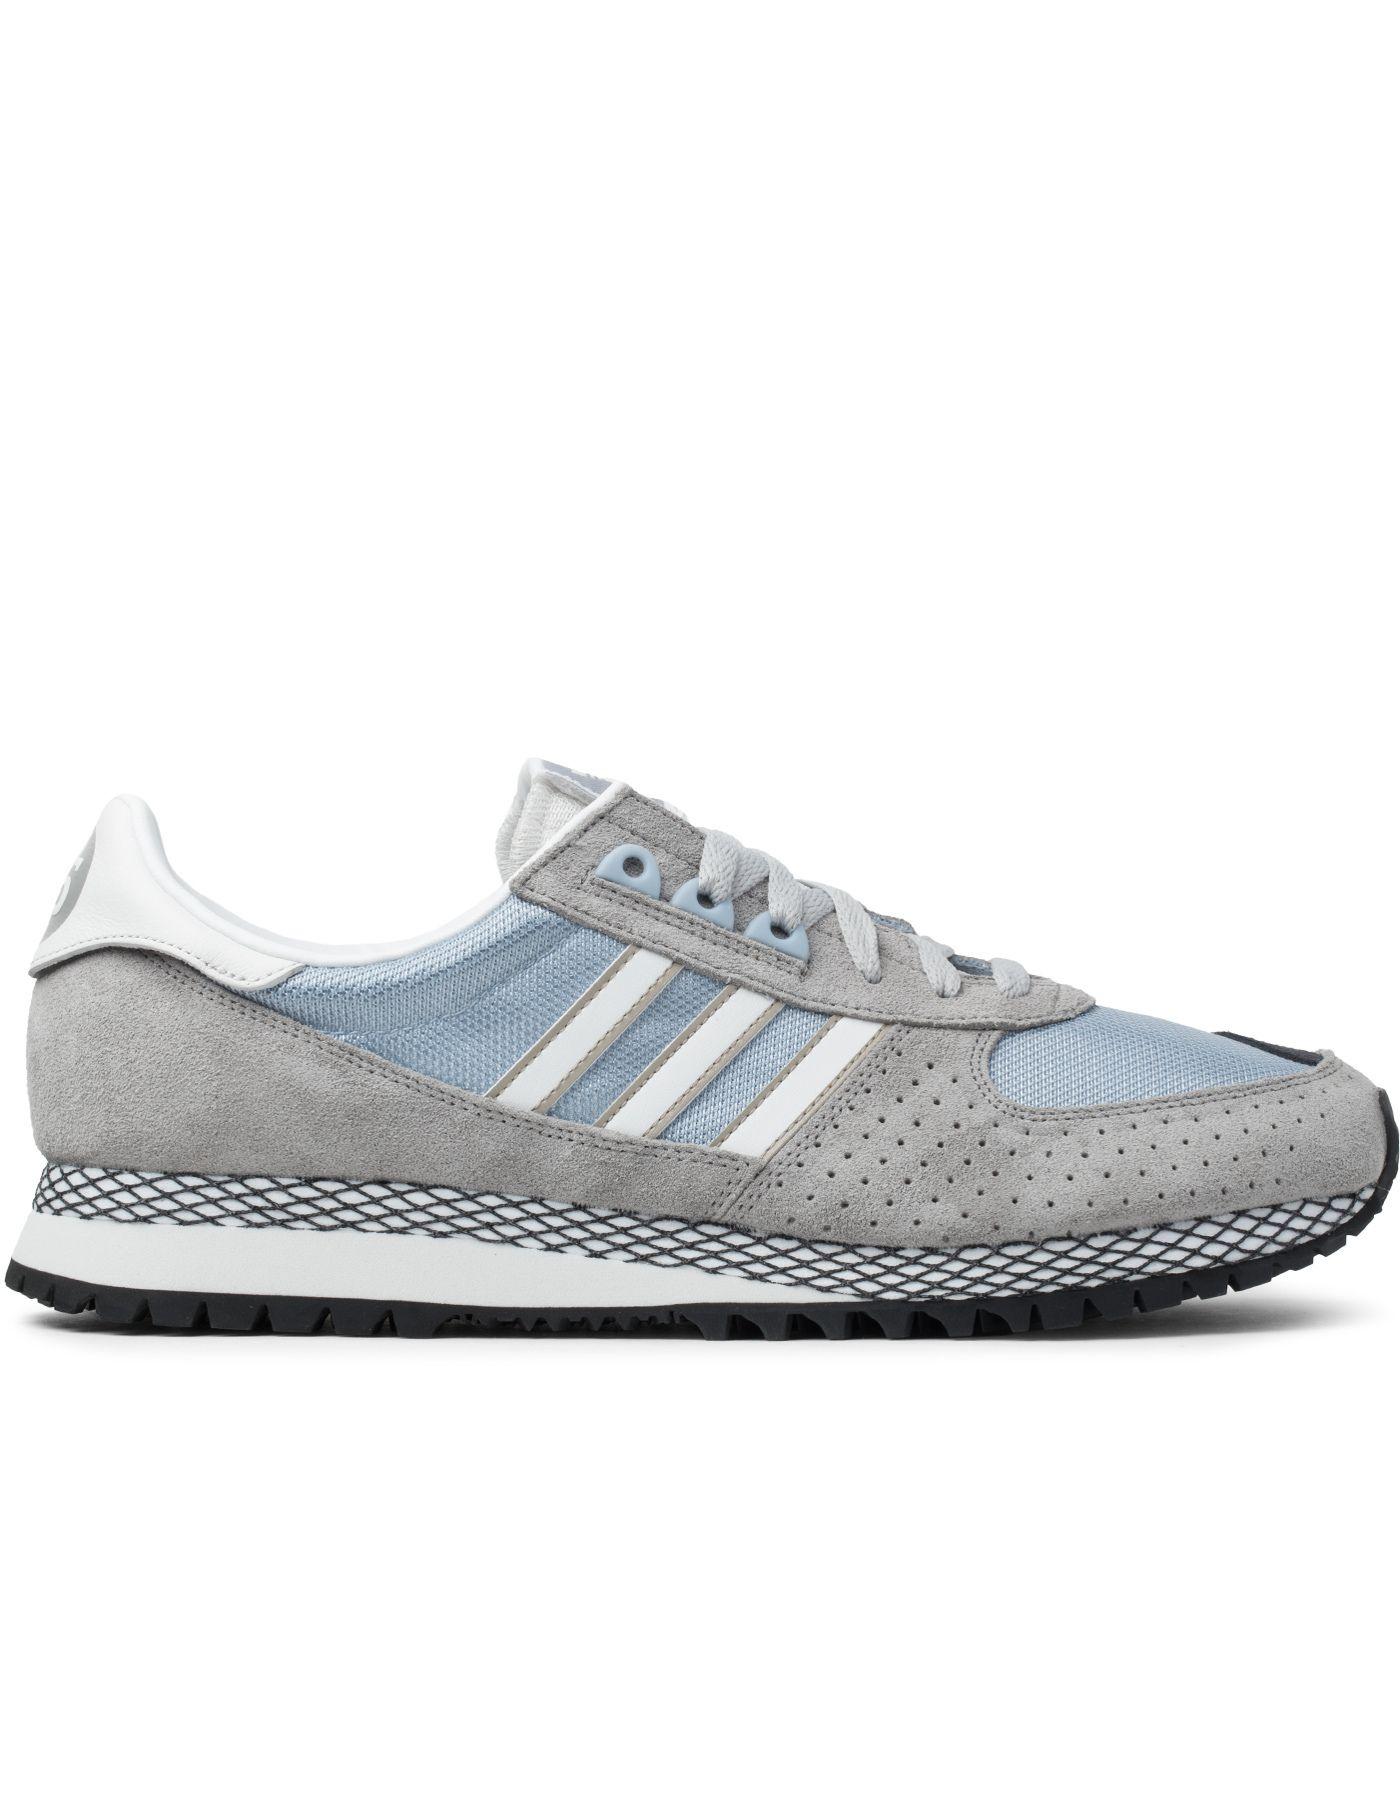 adidas Originals Charcoal/Solid Grey B35709 City Marathon PT Nigo    HYPEBEAST Store.